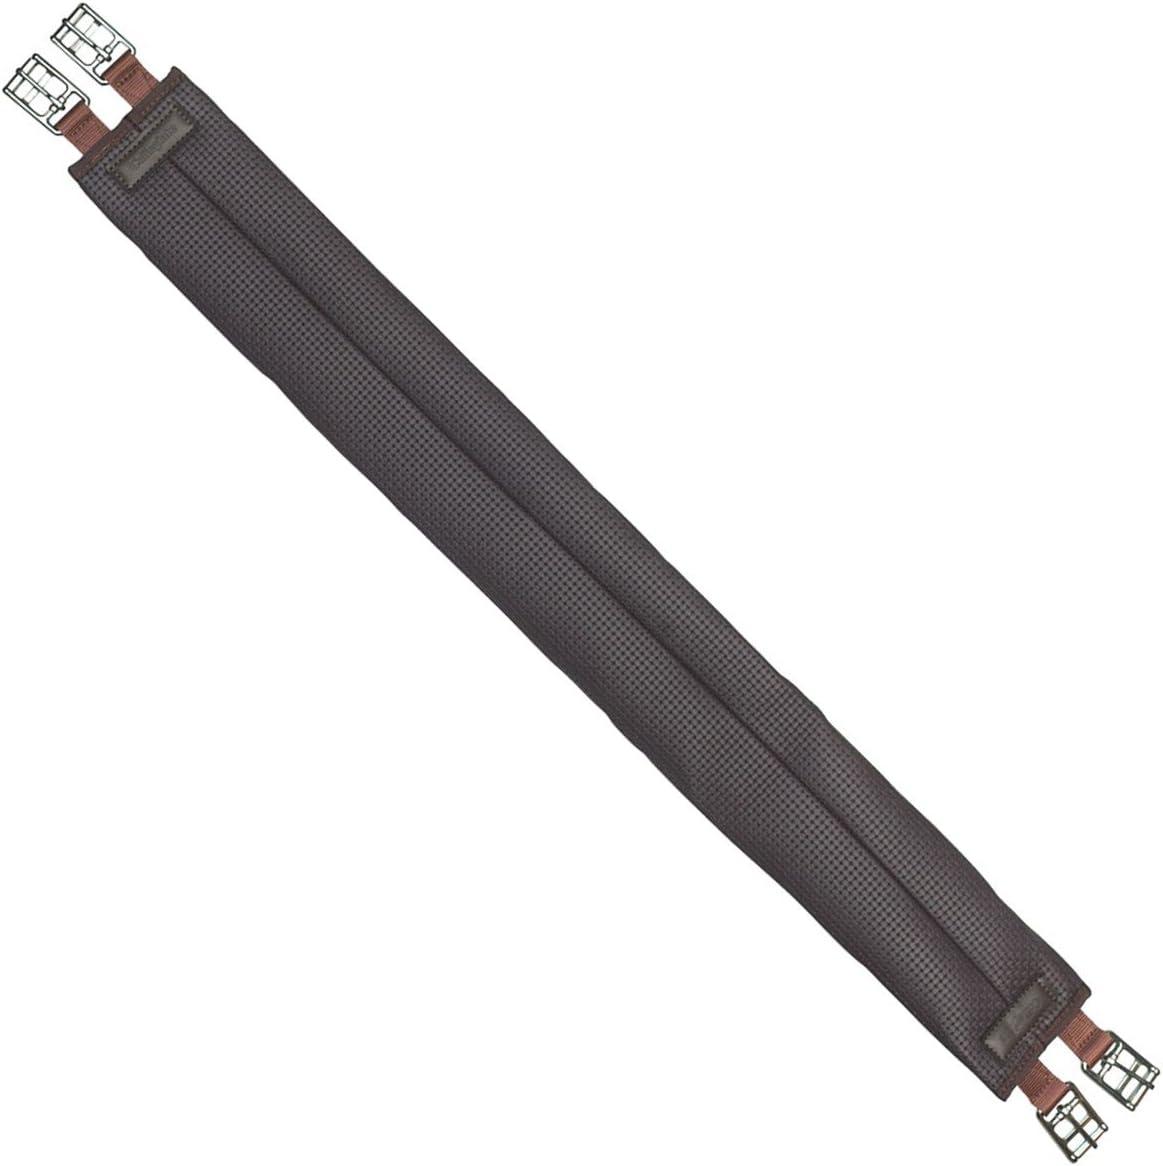 Collegiate Straight Long Elastic Girth